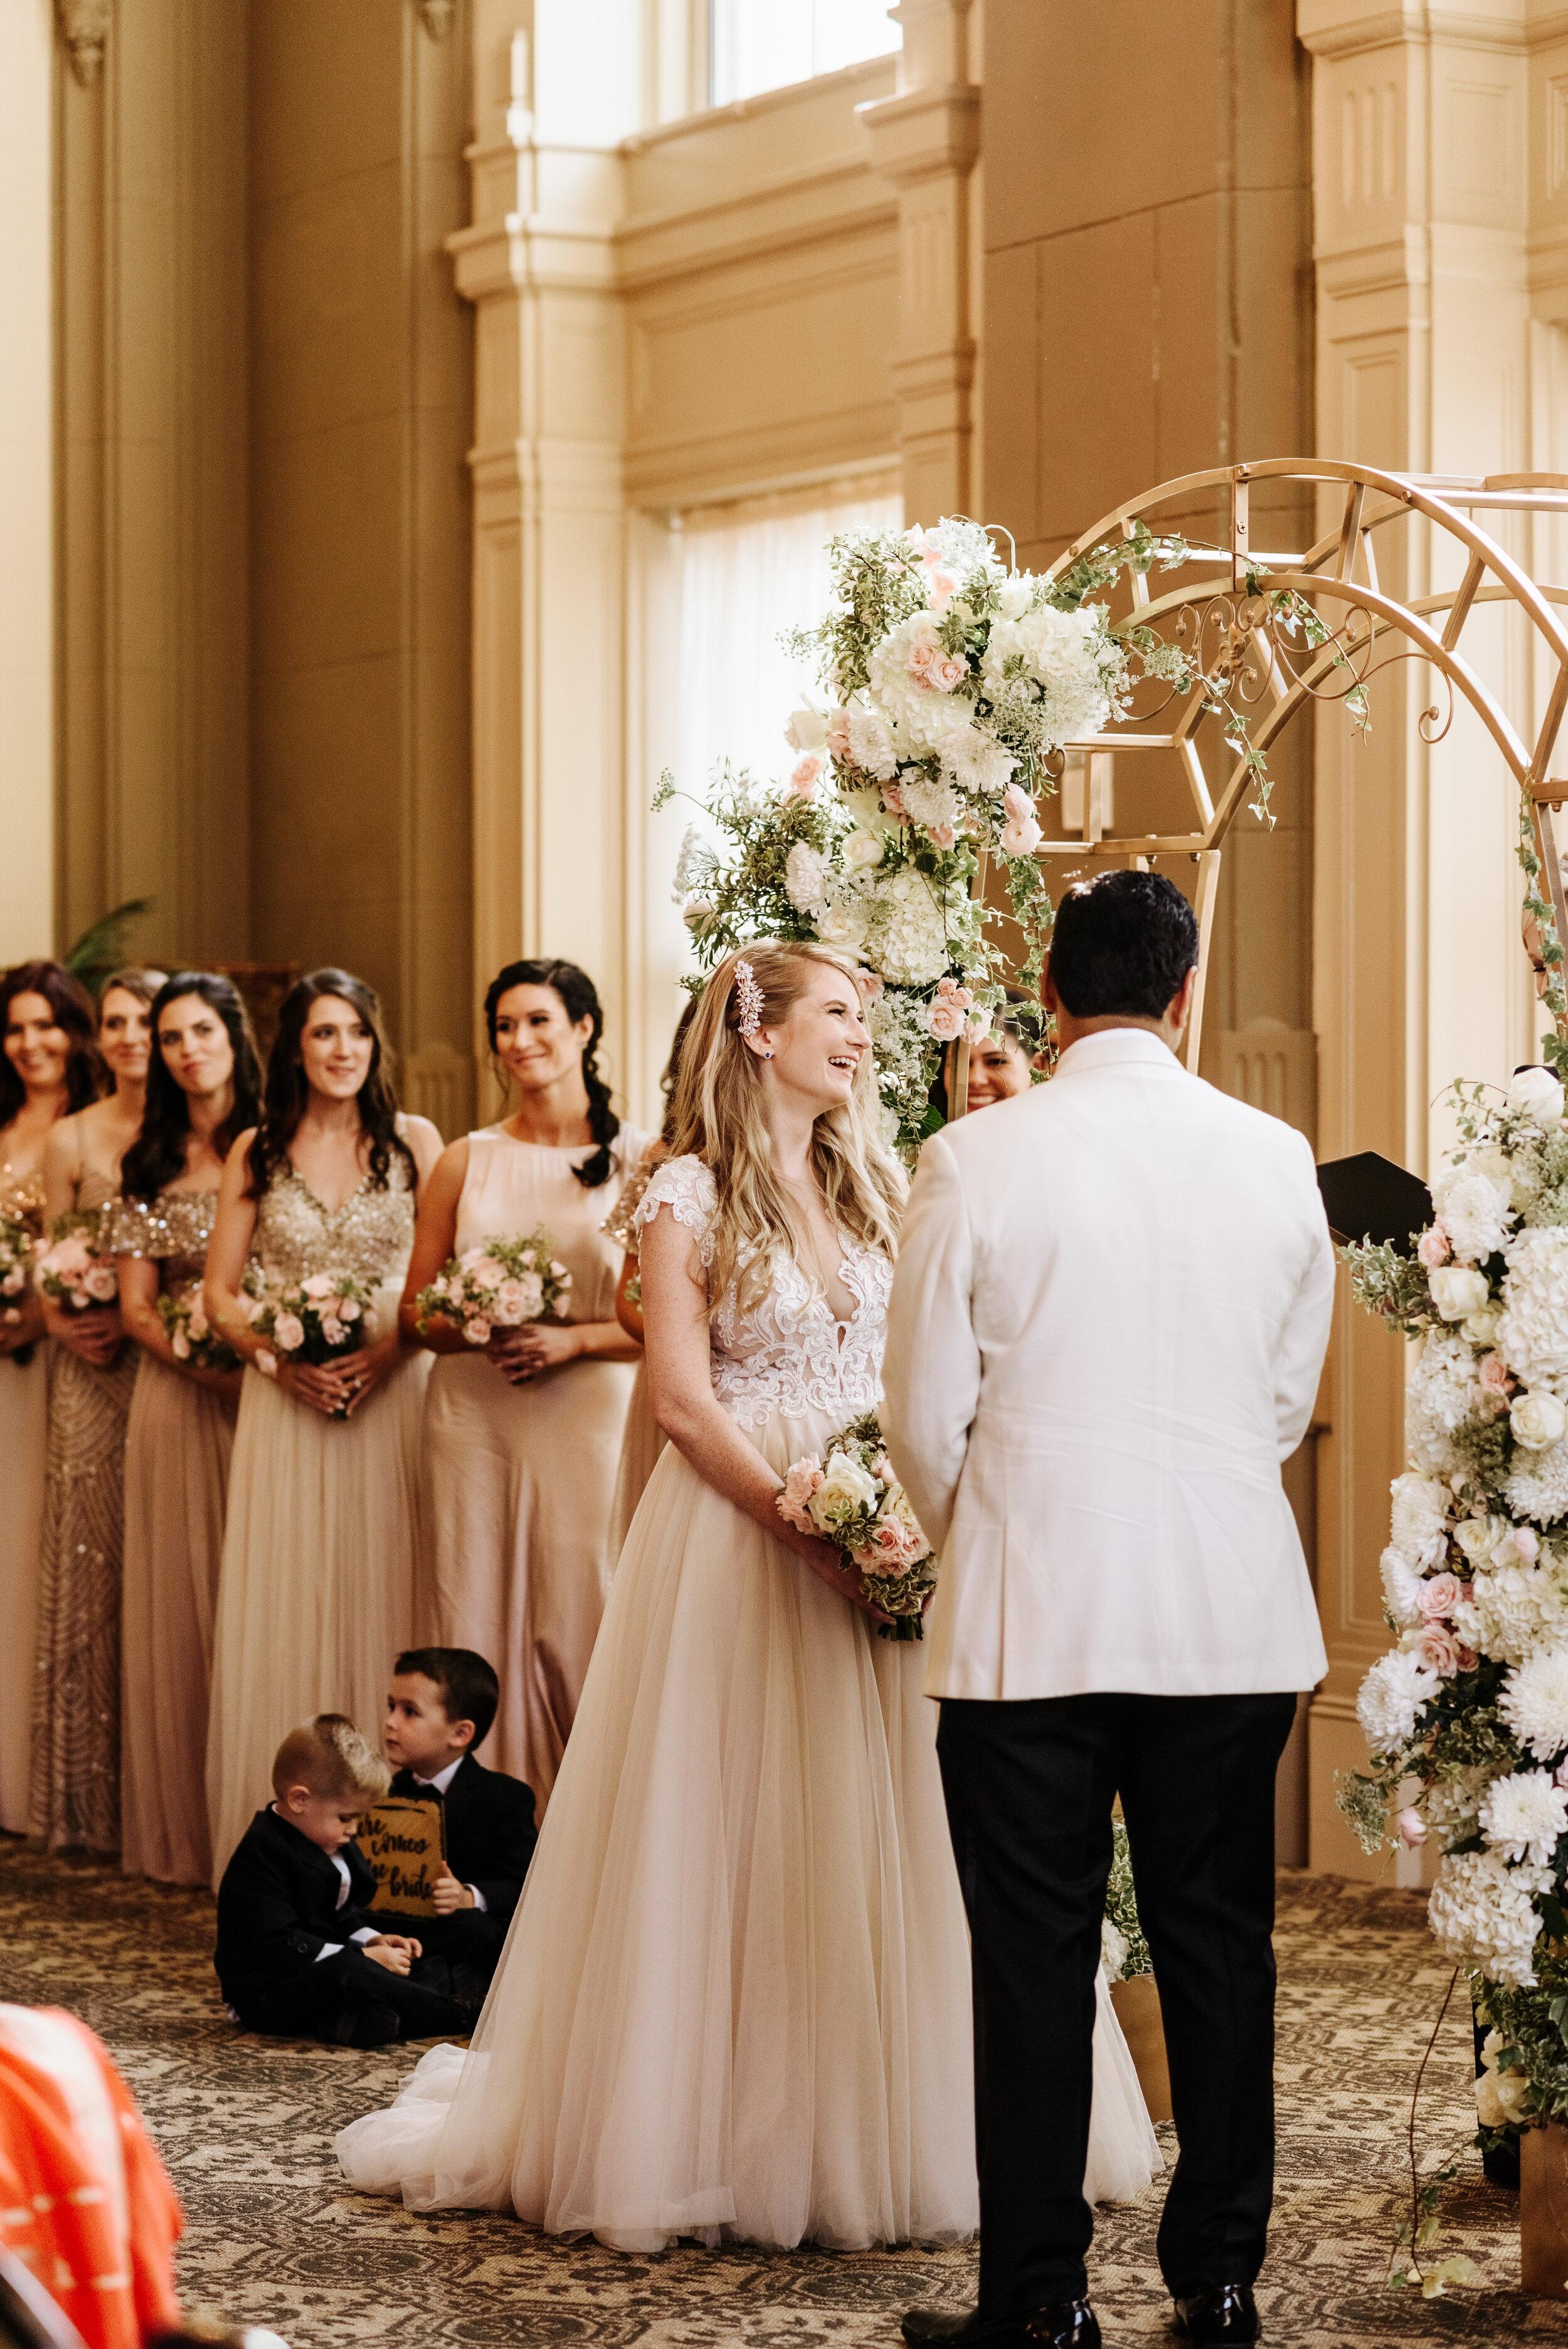 Cassie-Mrunal-Wedding-Quirk-Hotel-John-Marshall-Ballrooms-Richmond-Virginia-Photography-by-V-77.jpg